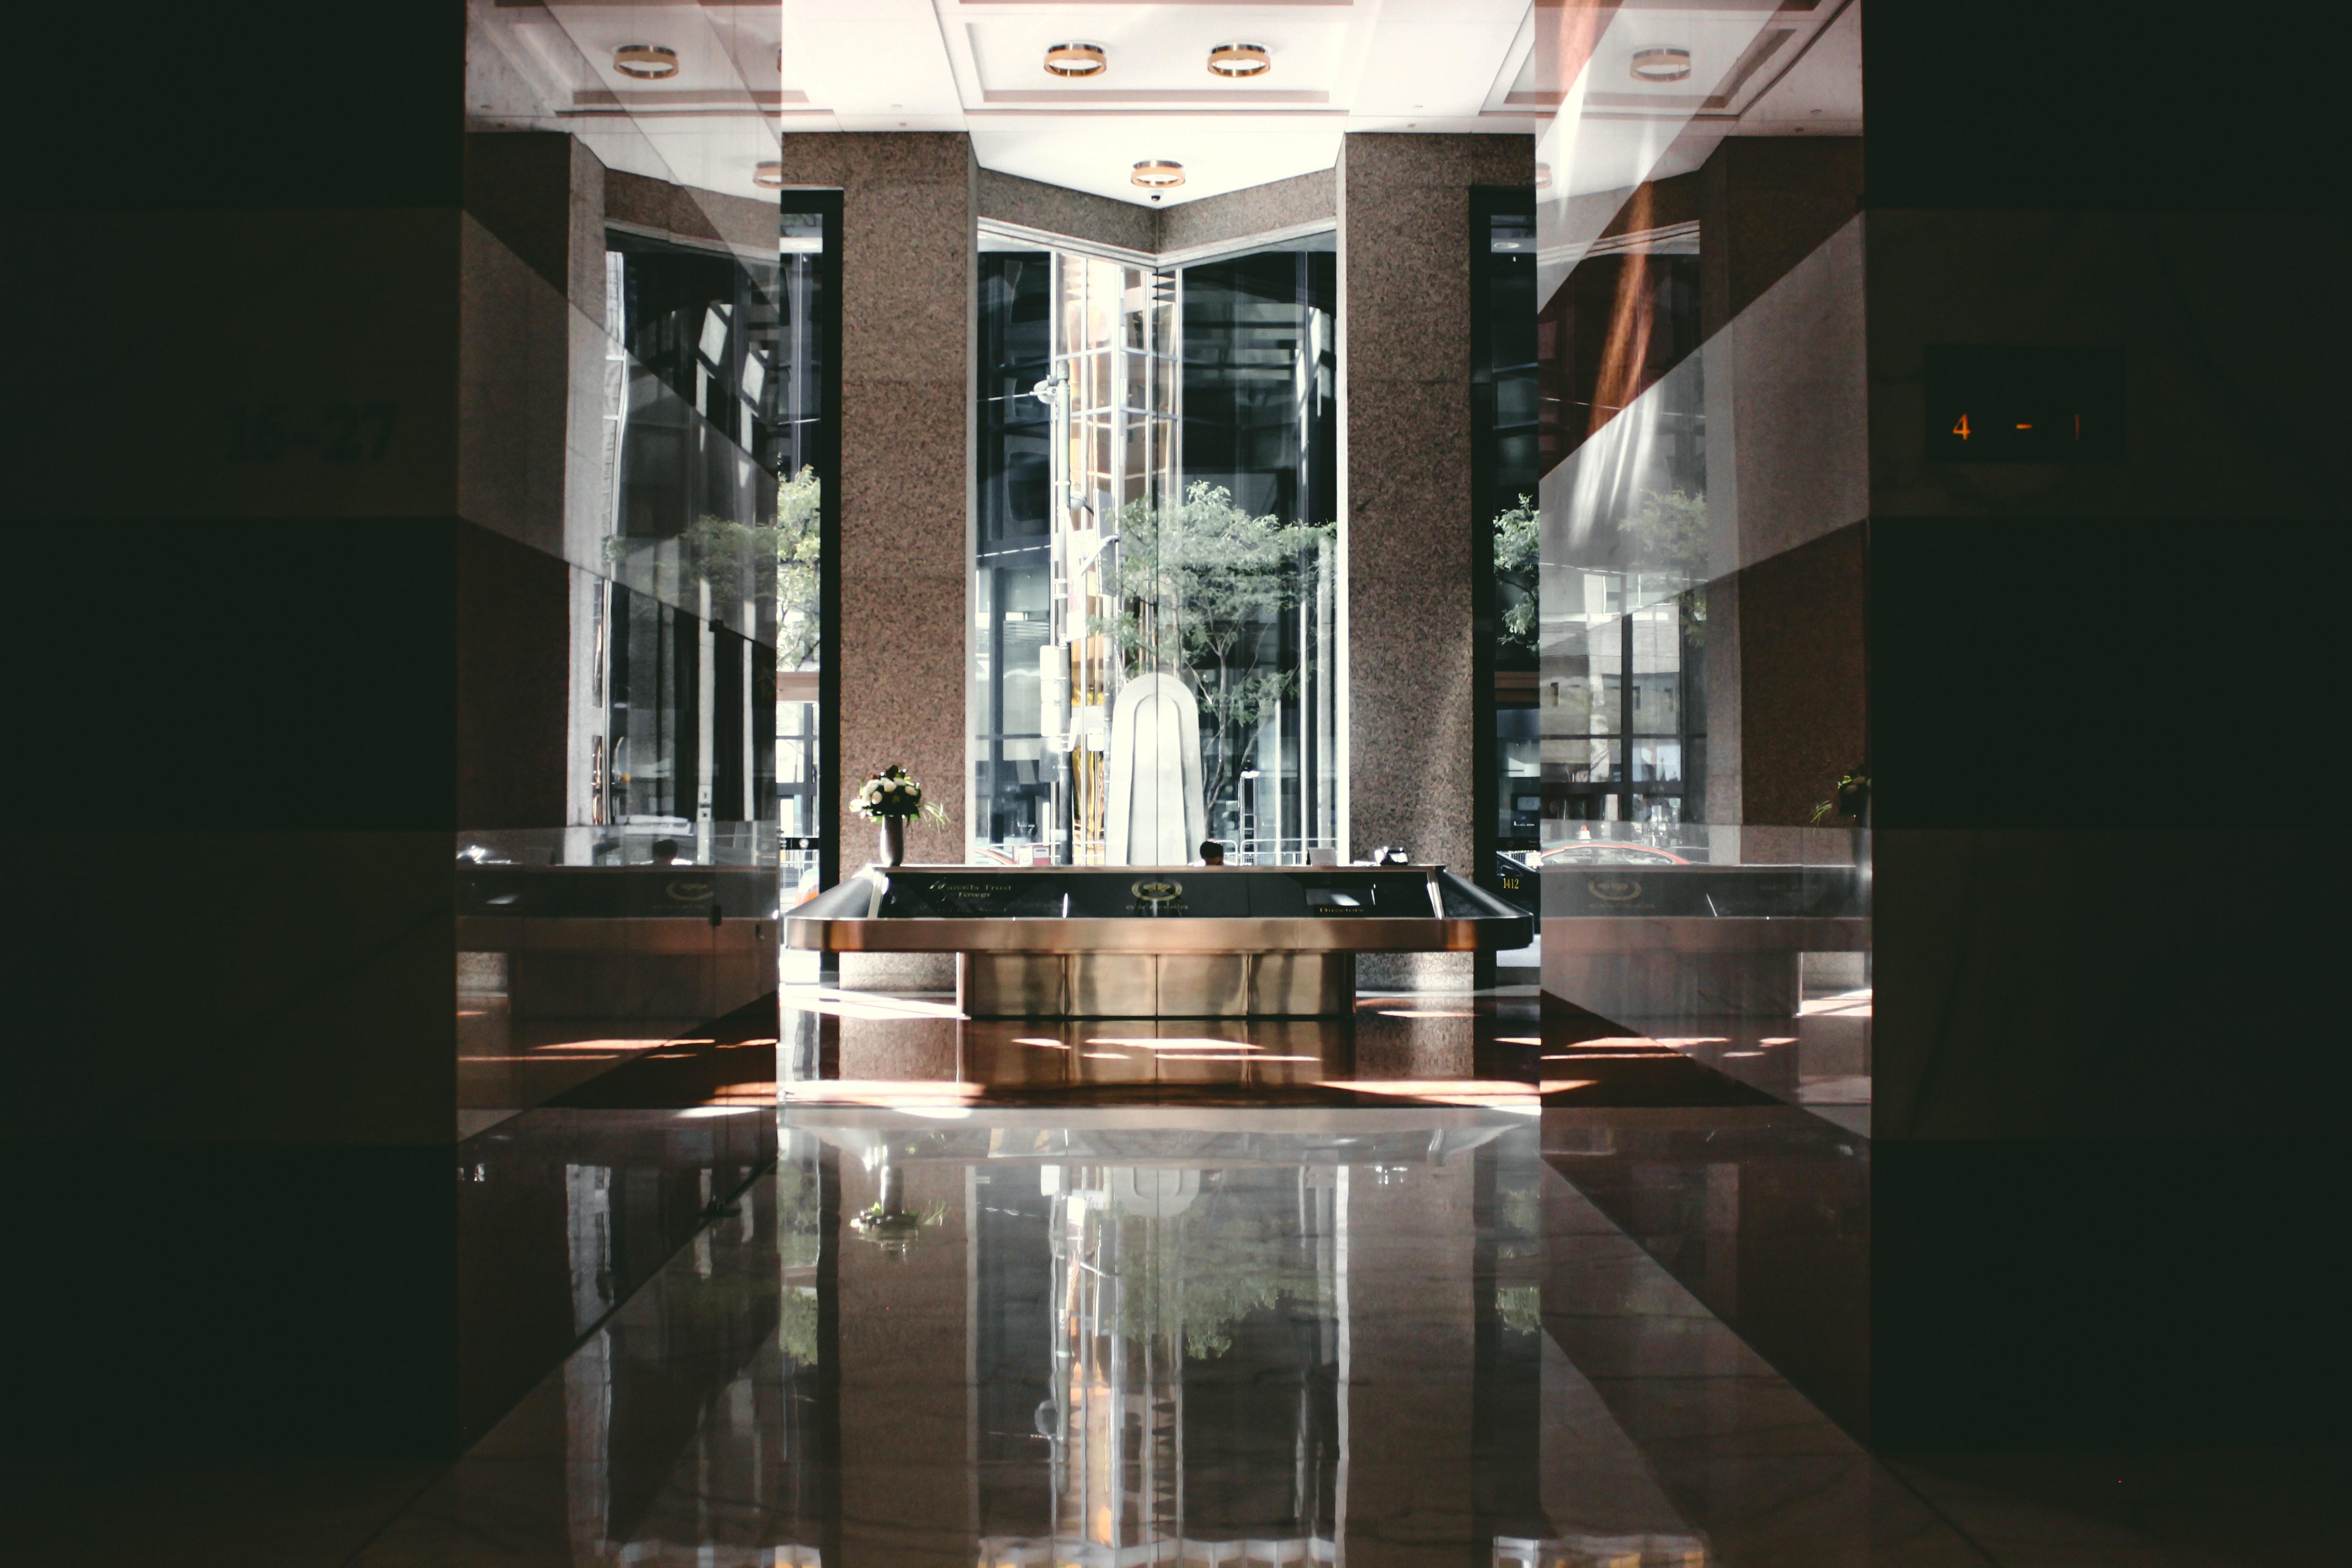 Brown Rectangular Table, Reflection, Reception, Shiny, Modern, HQ Photo